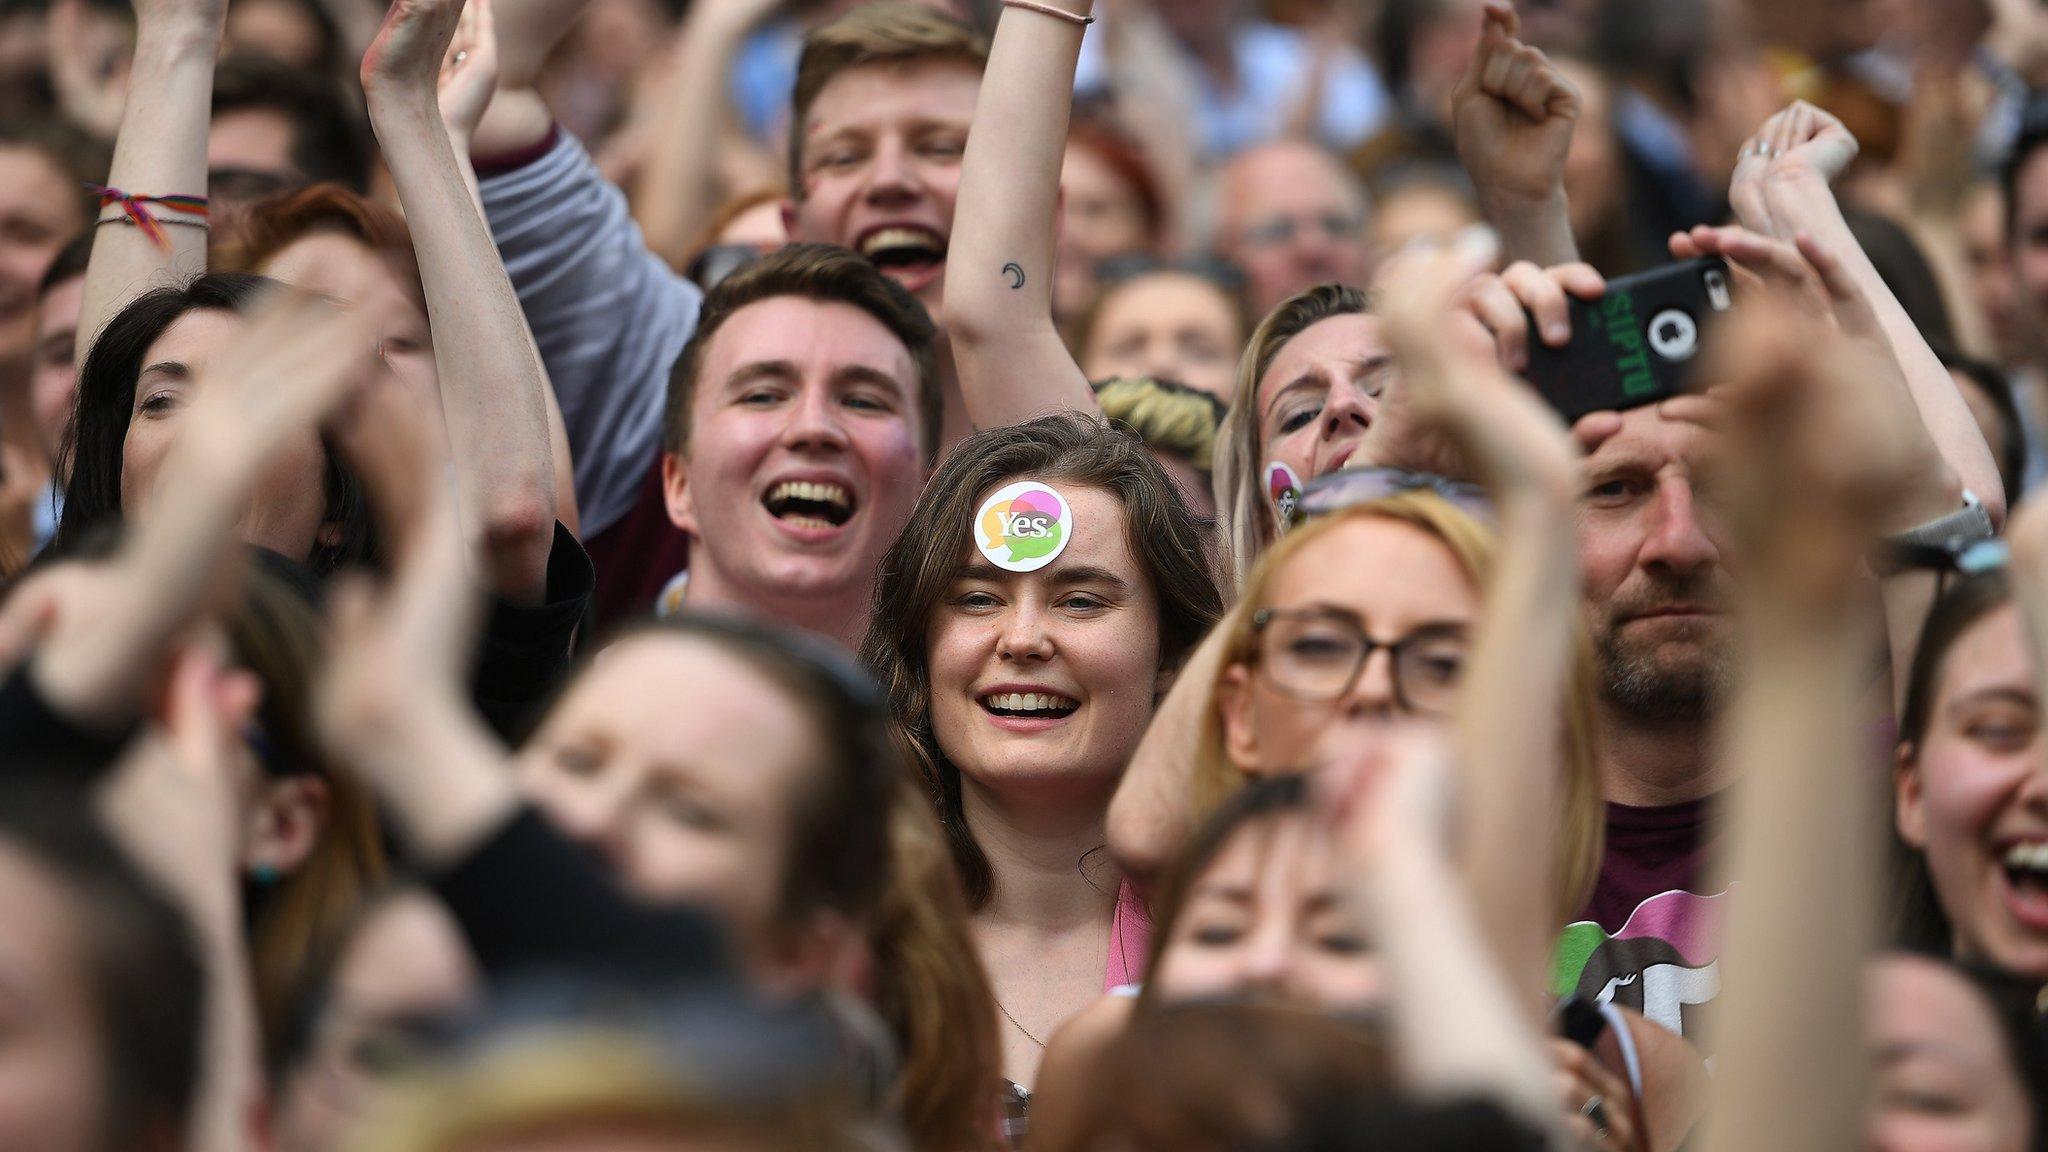 Irish abortion referendum: New laws by end of the year - Irish PM